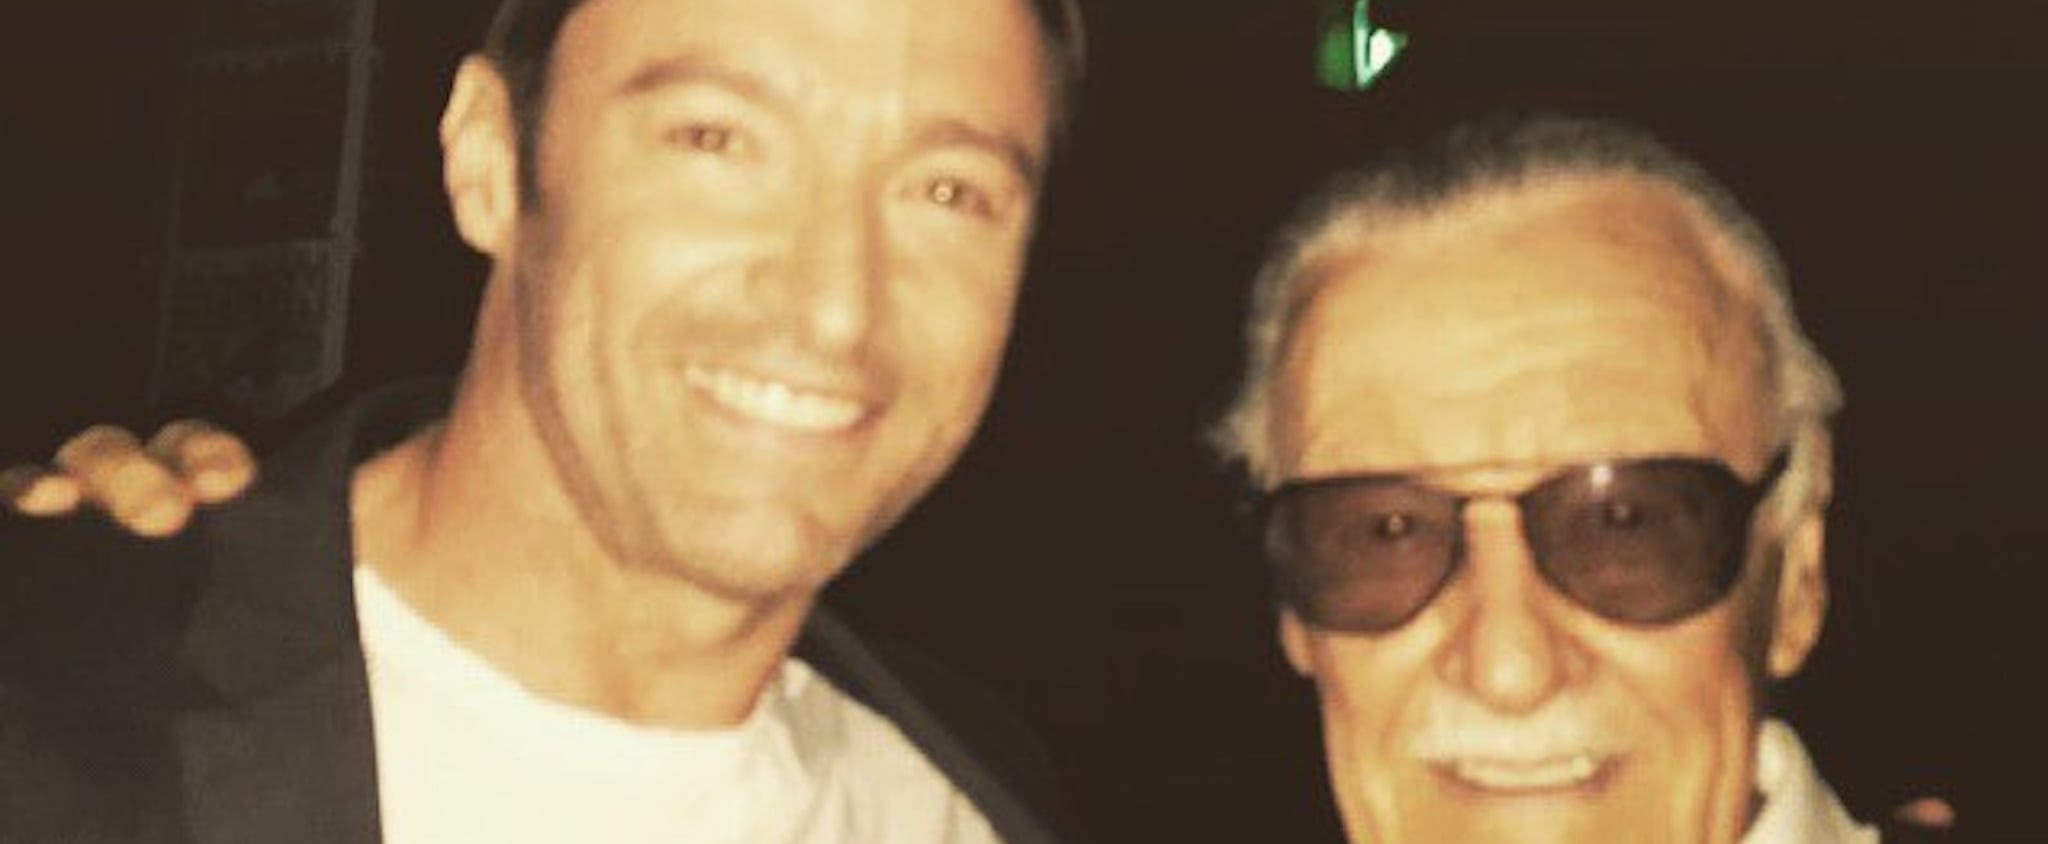 Hugh Jackman's Reaction to Stan Lee's Death November 2018